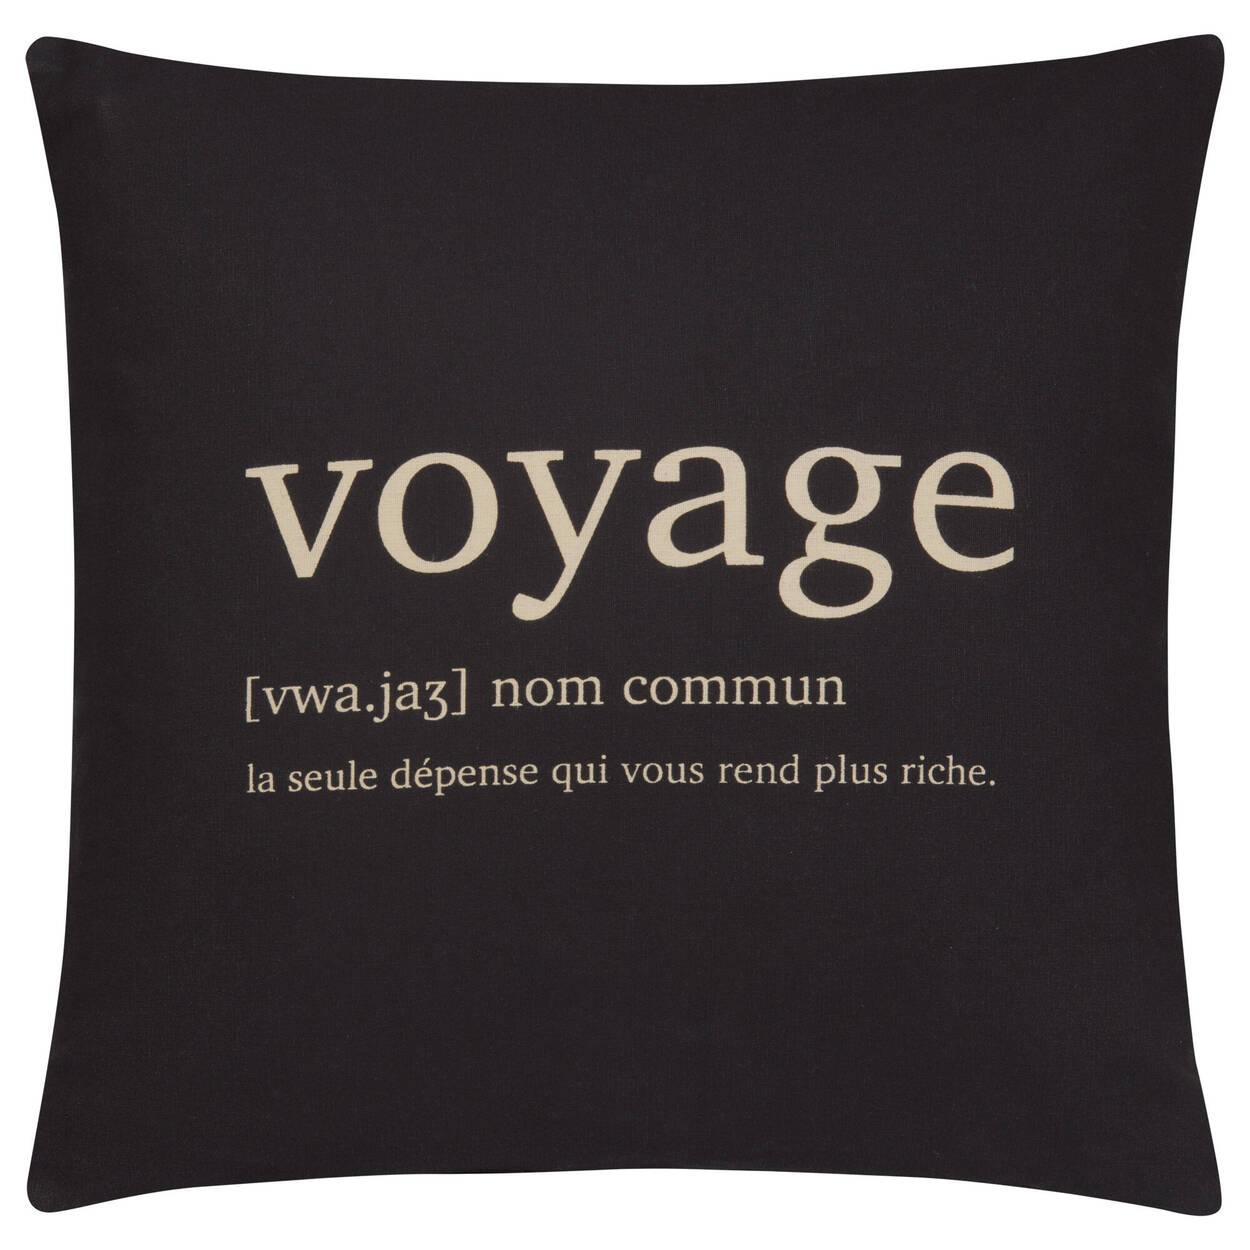 "Voyage Decorative Pillow Cover 18"" X 18"""